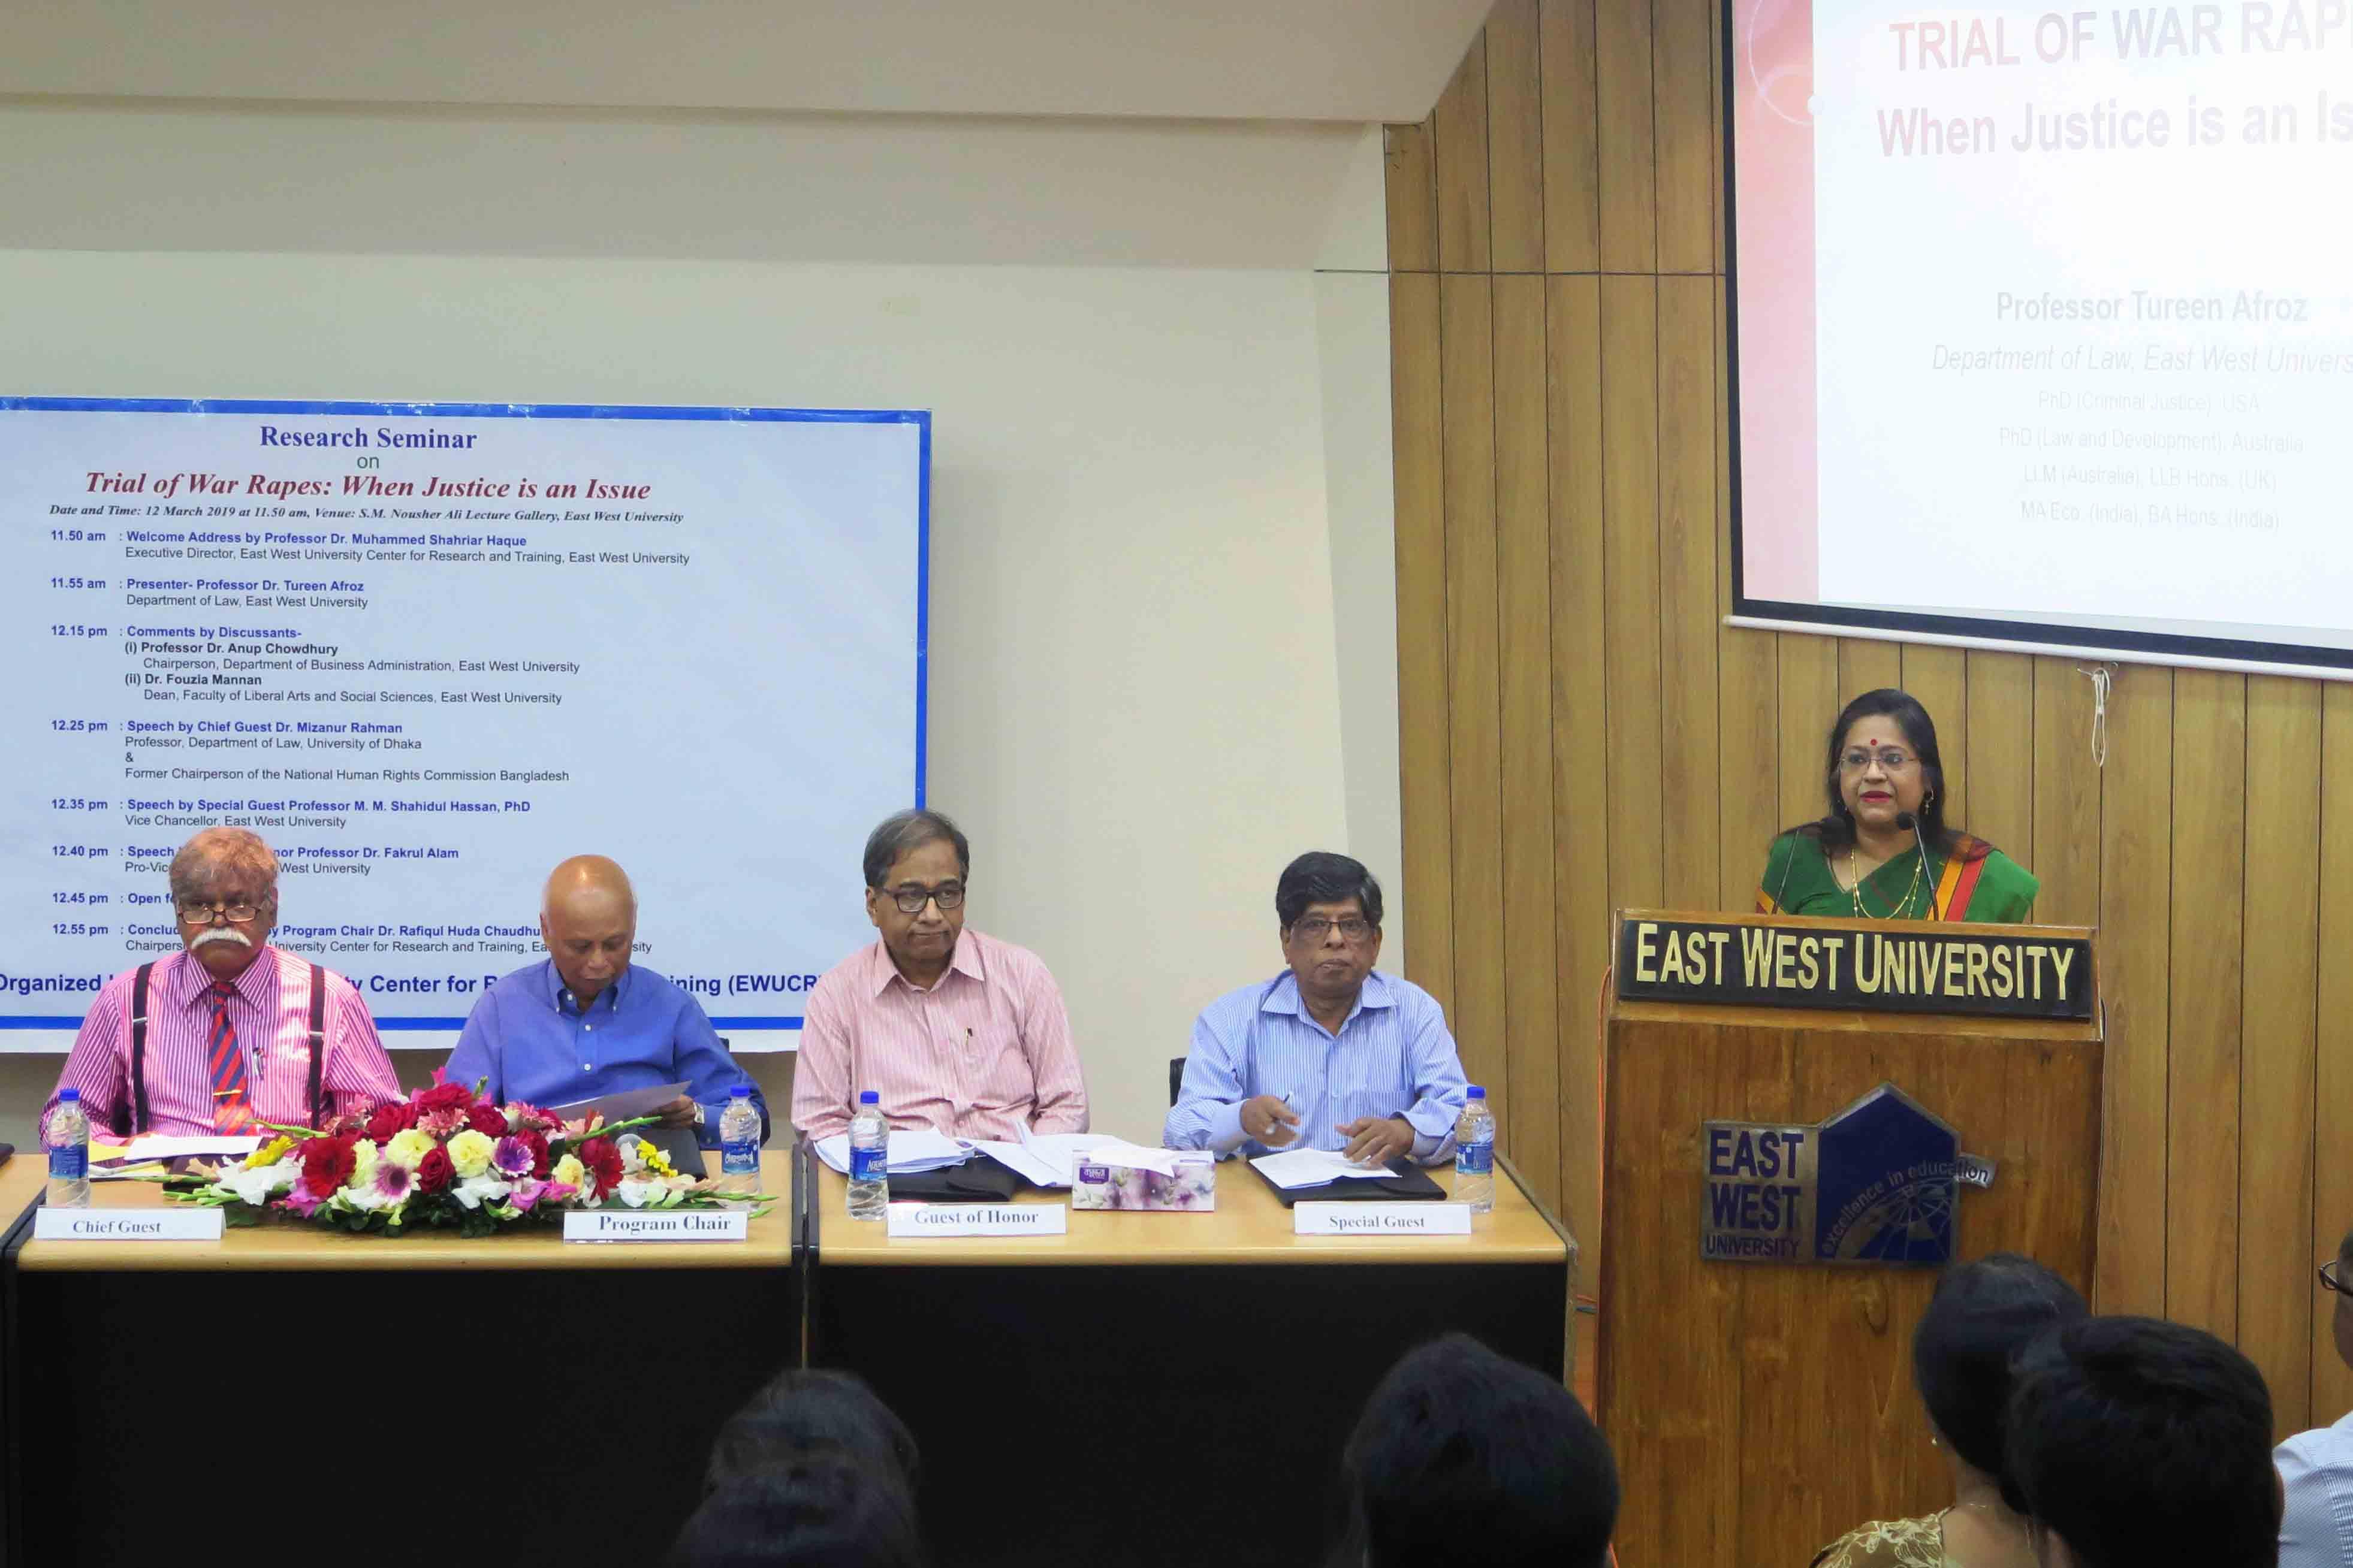 EWU Organizes a Research Seminar on War Rapes